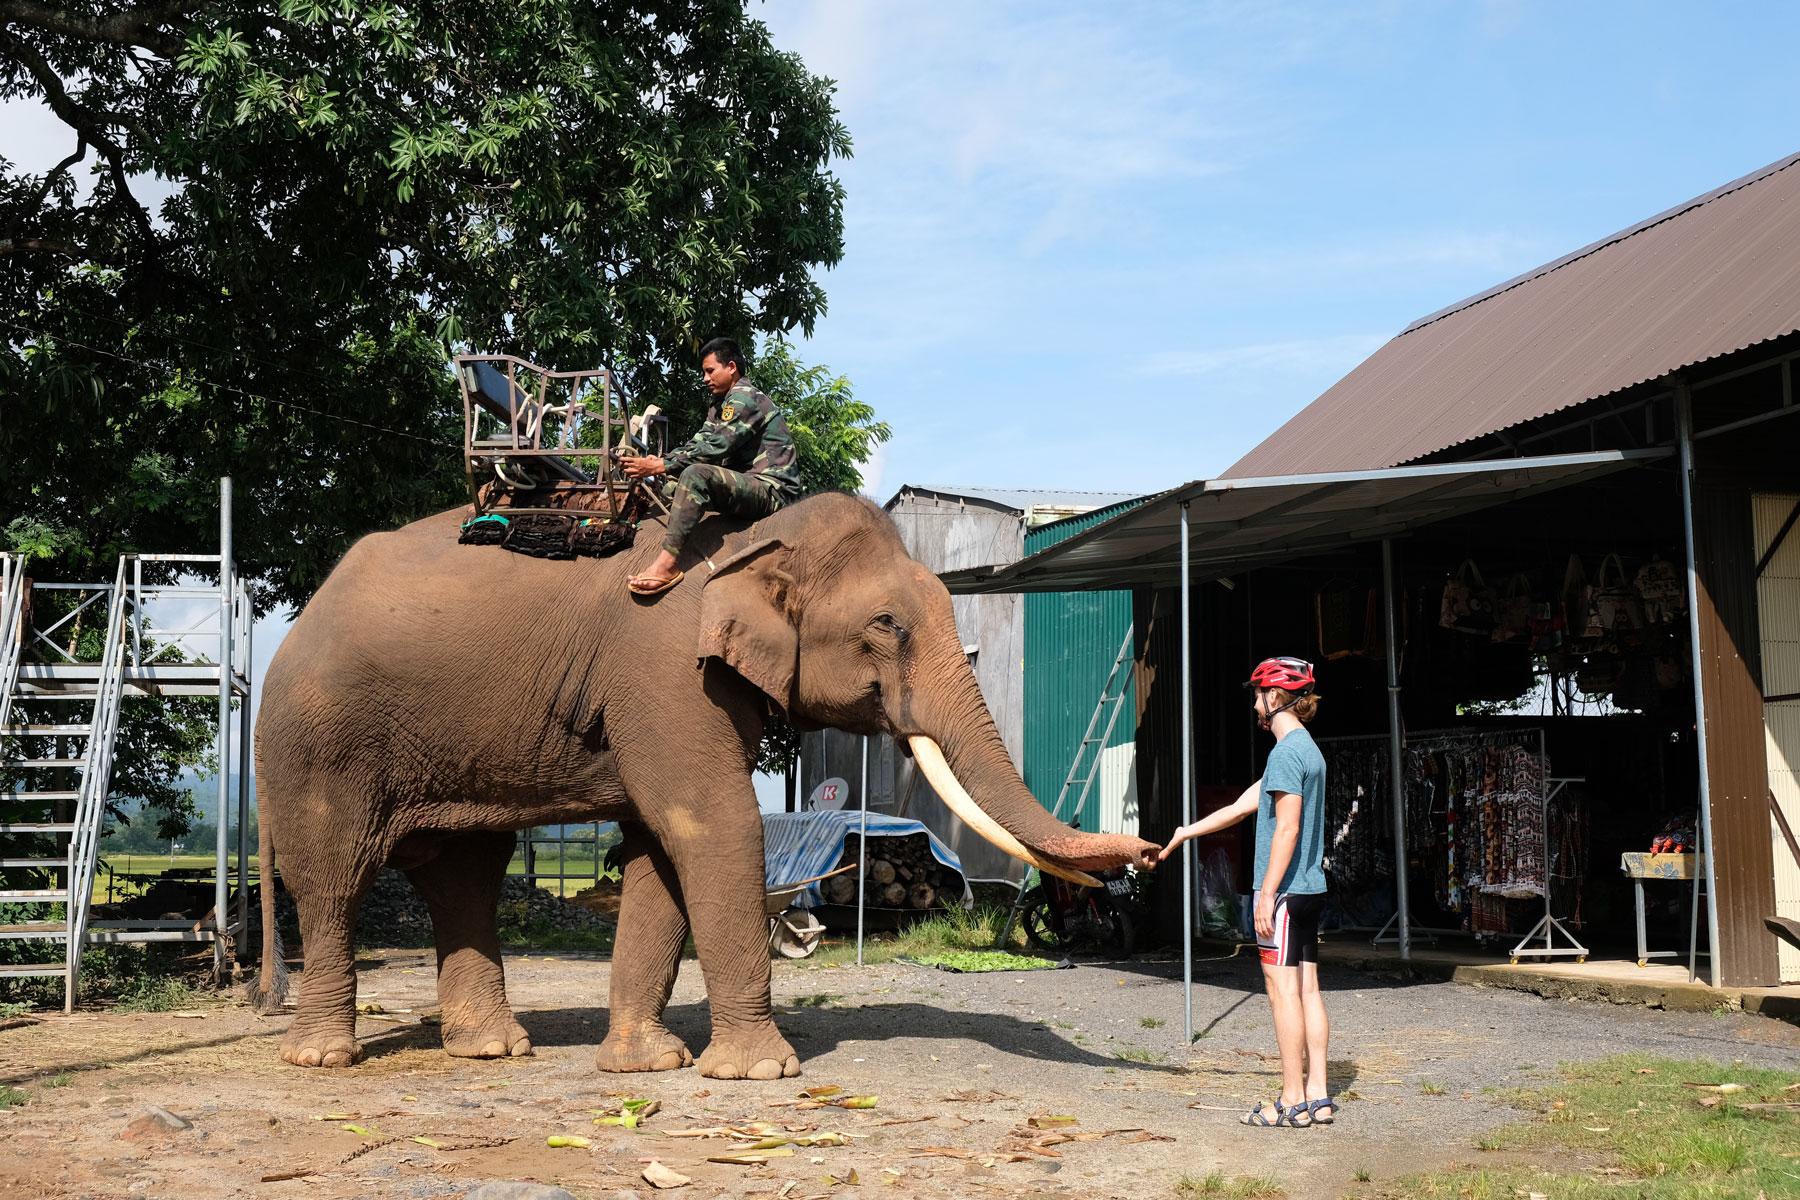 Sebastian begrüßt einen Elefanten in Lien Son in Vietnam.